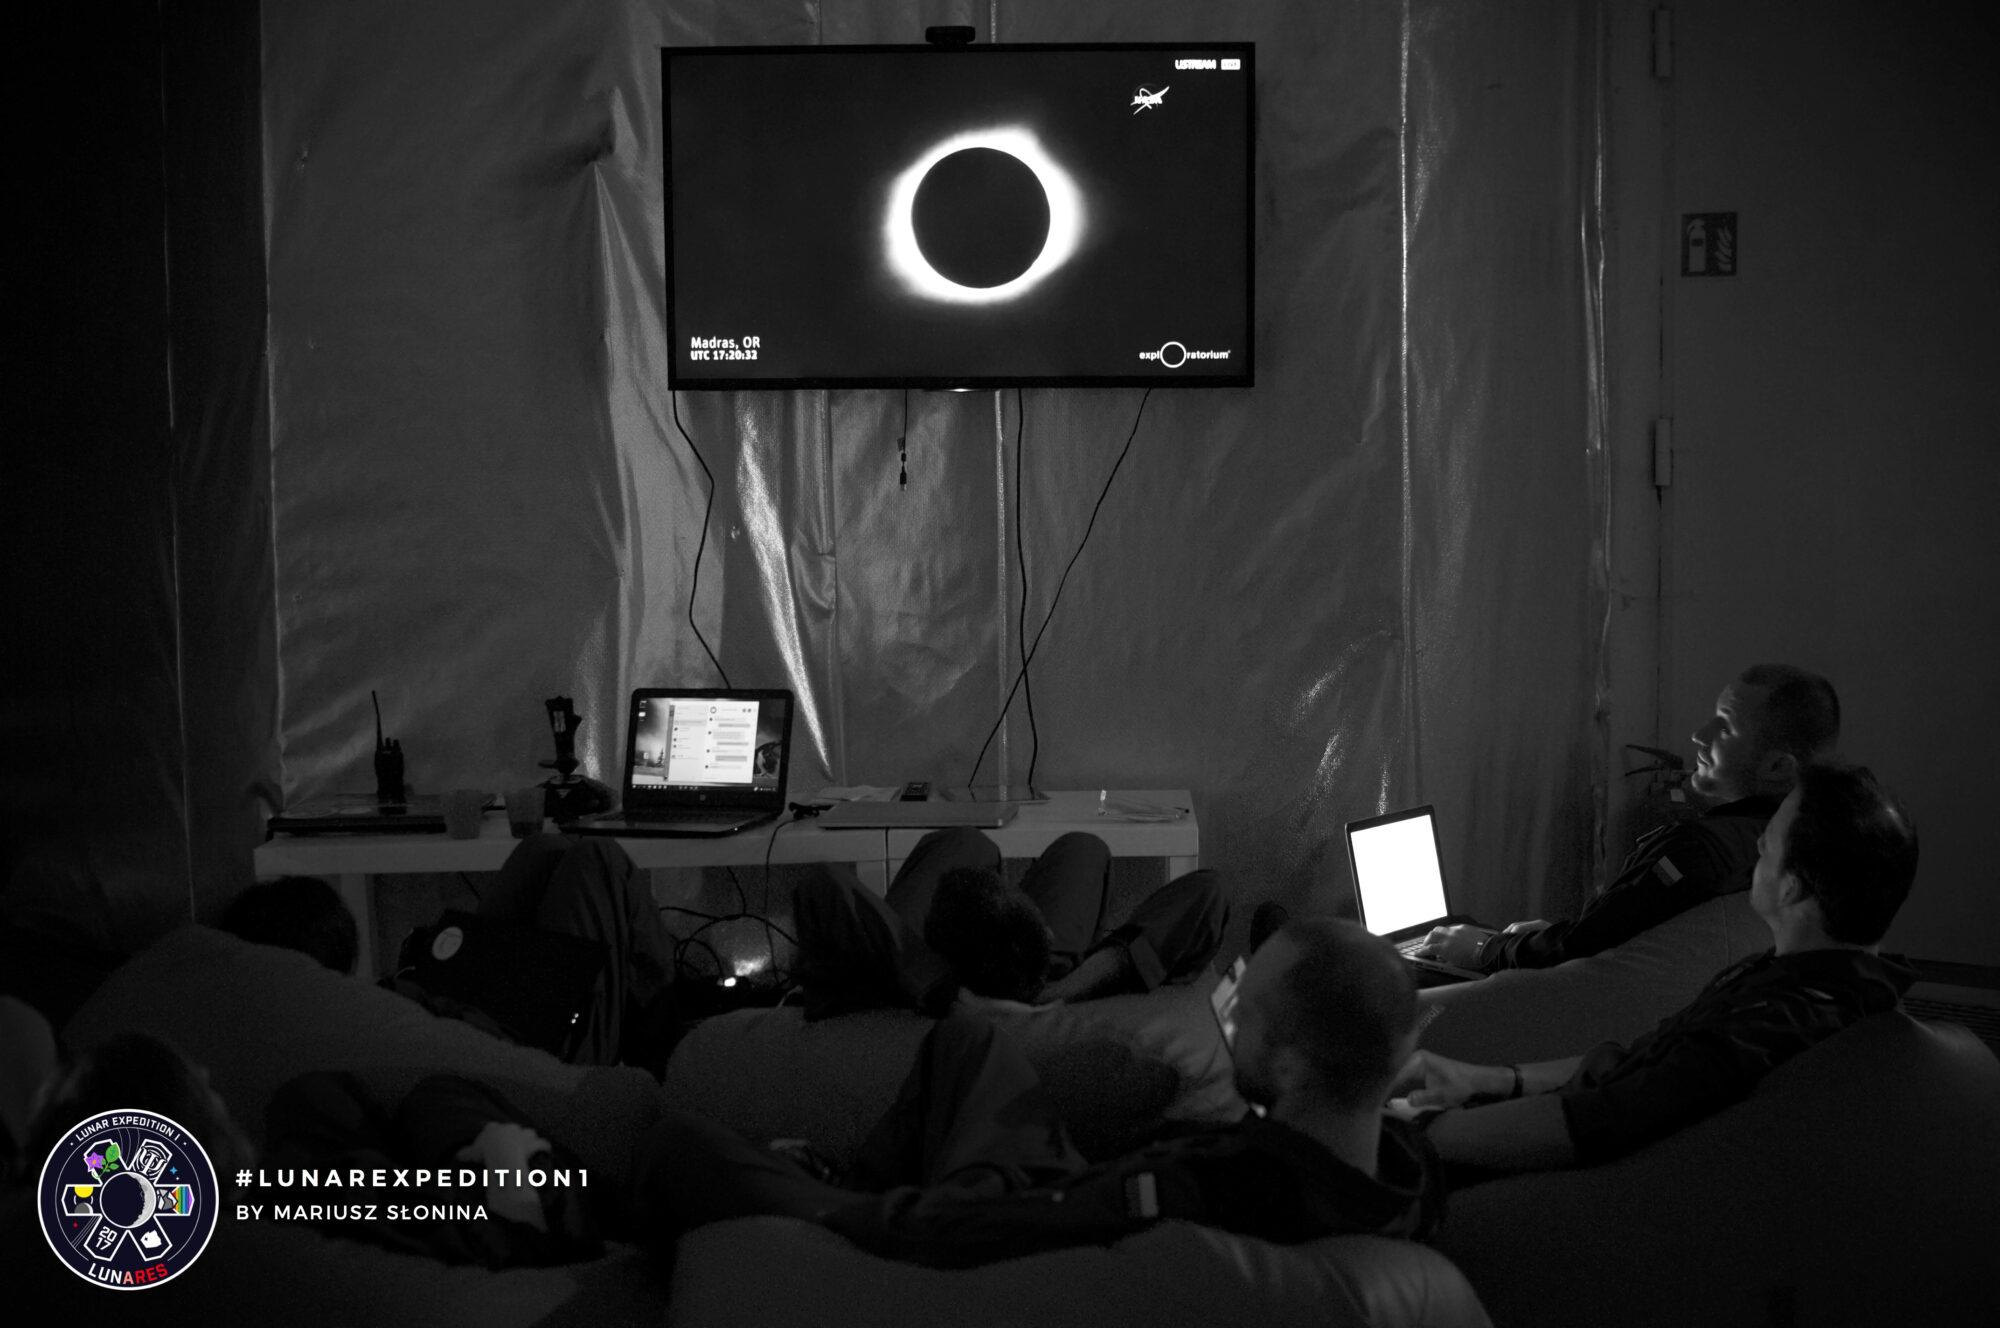 lunar-expedition-01/ND_20170821_192436_2111_001.jpg